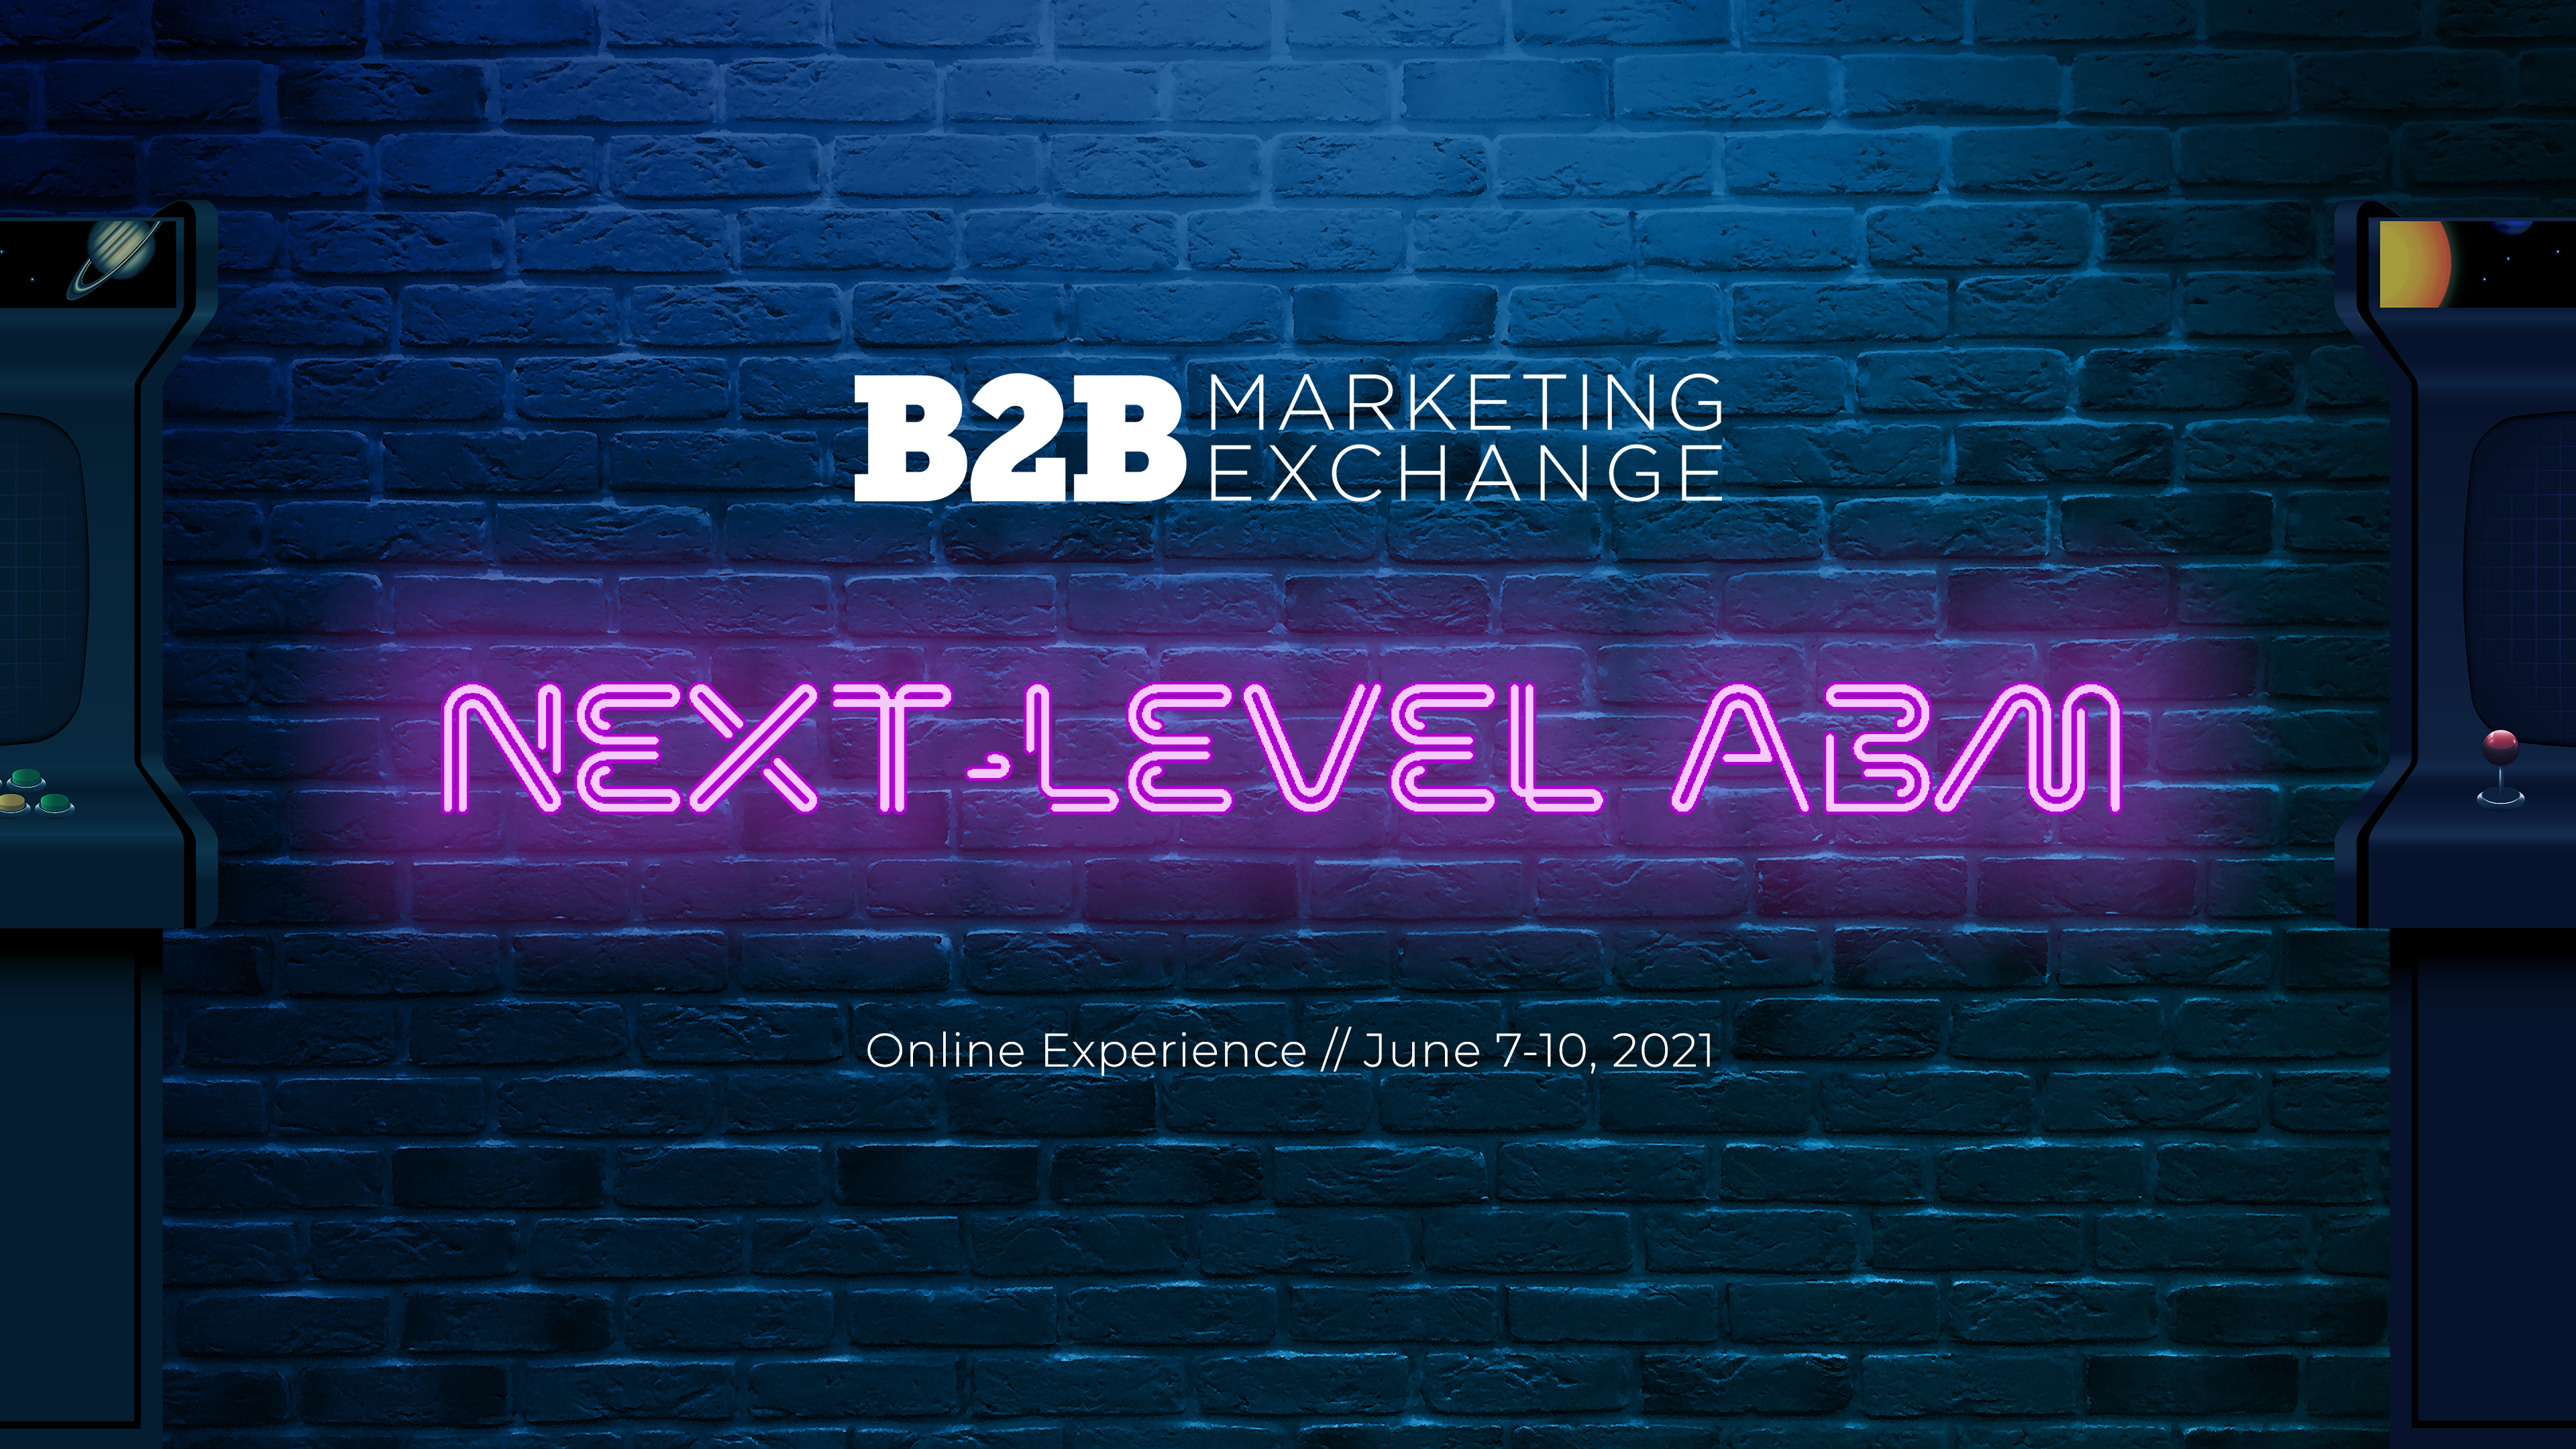 Precision Partnering Gets Spotlight At B2BMX: Next-Level ABM Virtual Conference